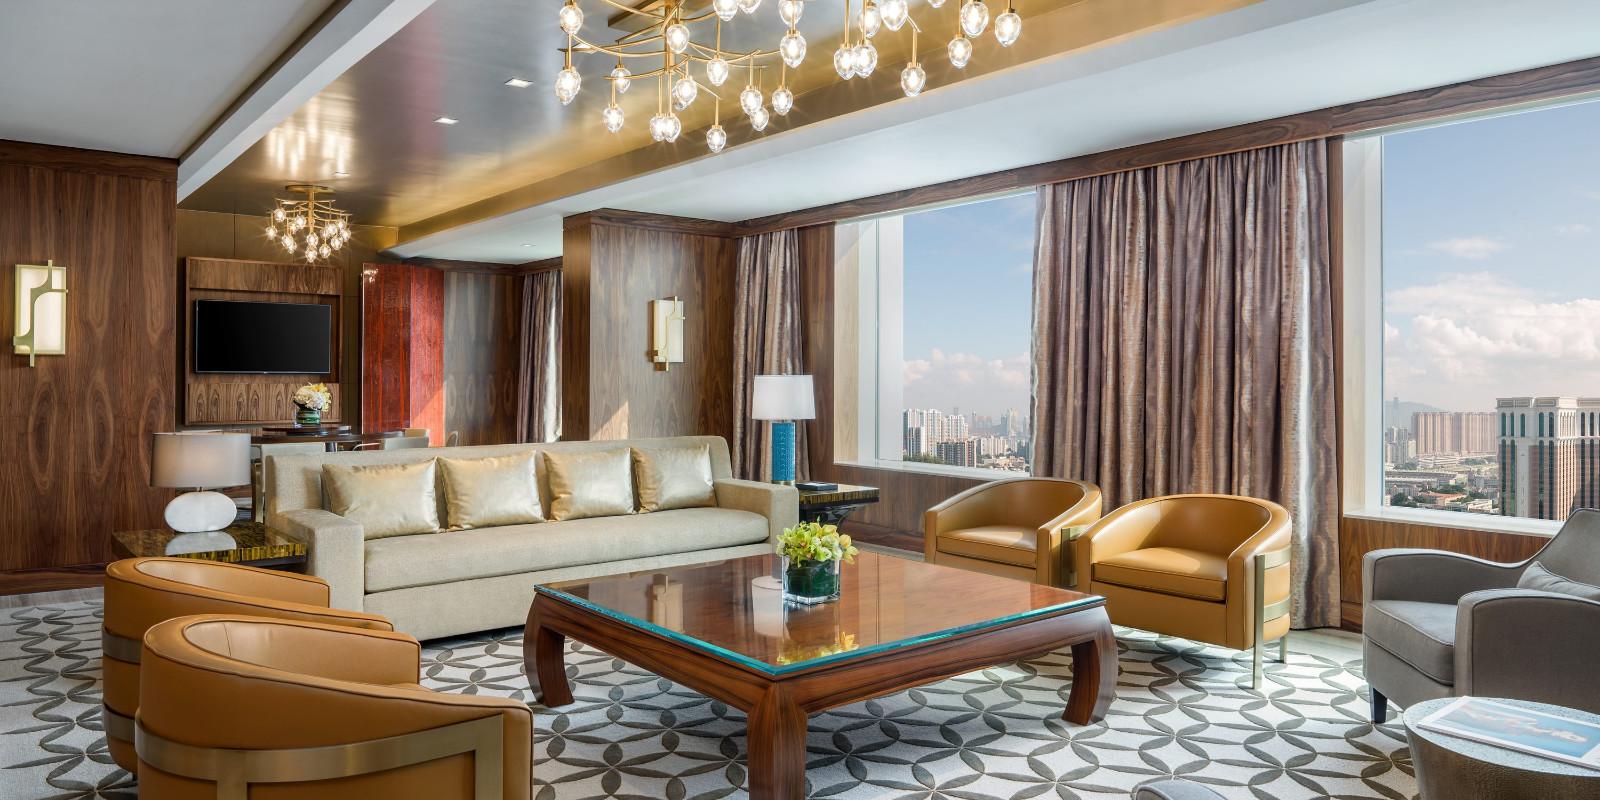 YSK Furniture hot-sale clubhouse furniture custom made for hotel-1